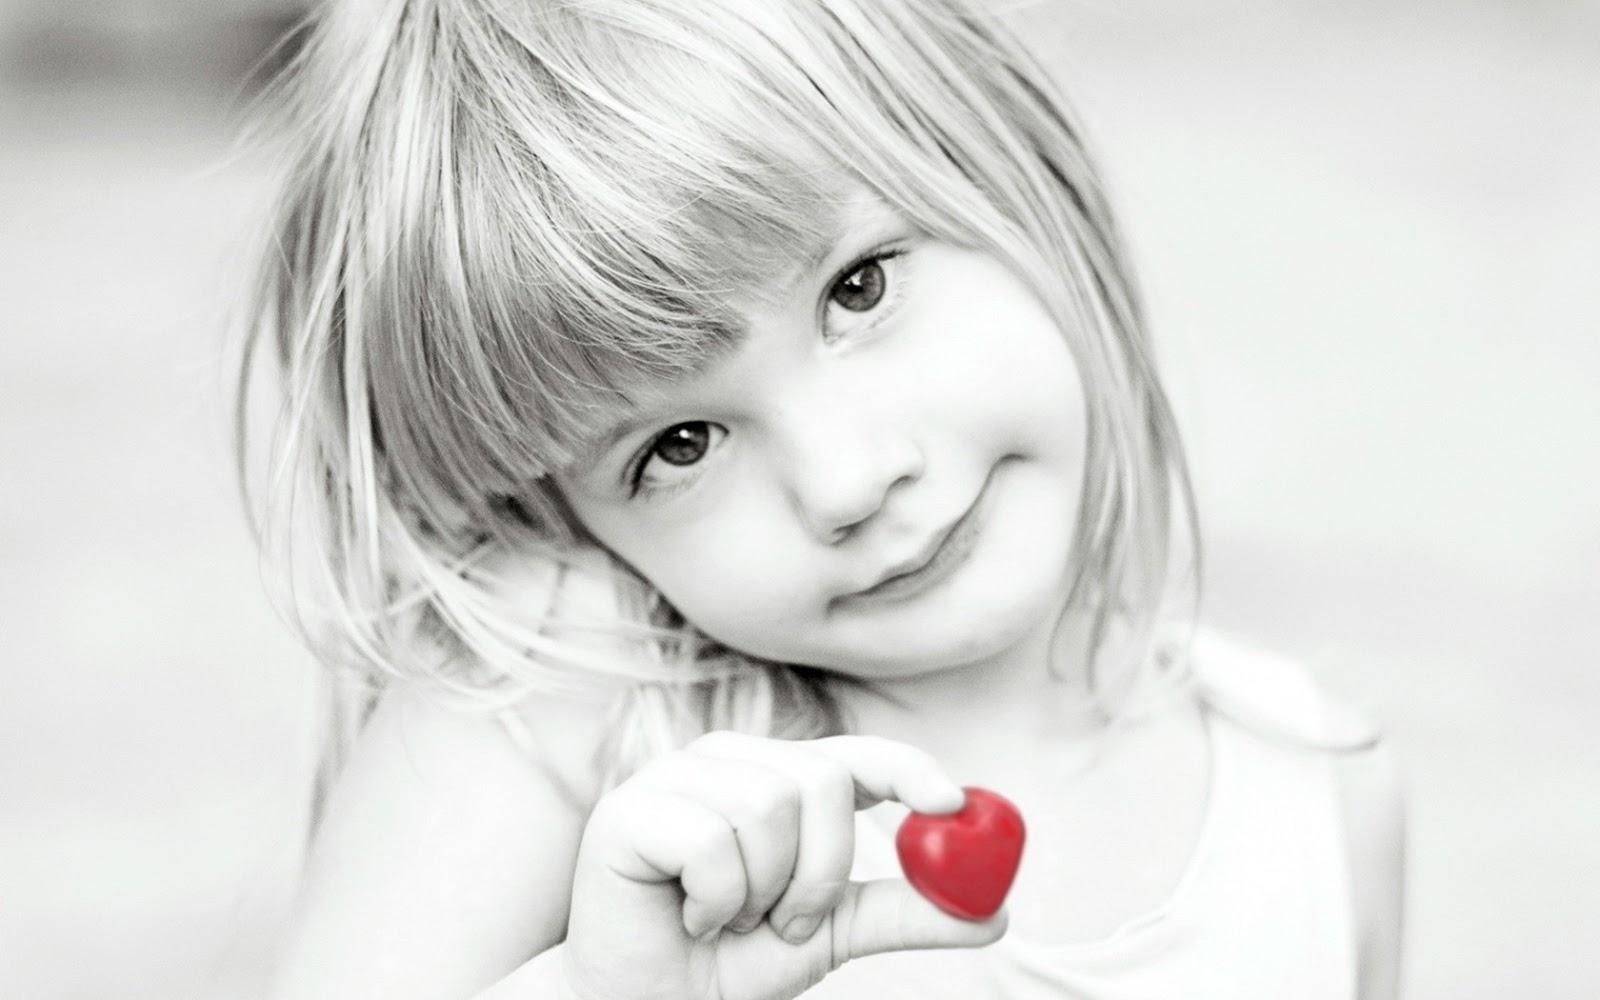 Cute little baby girl holding heart hd wallpaper cute little babies cute little baby girl holding heart hd wallpaper voltagebd Choice Image